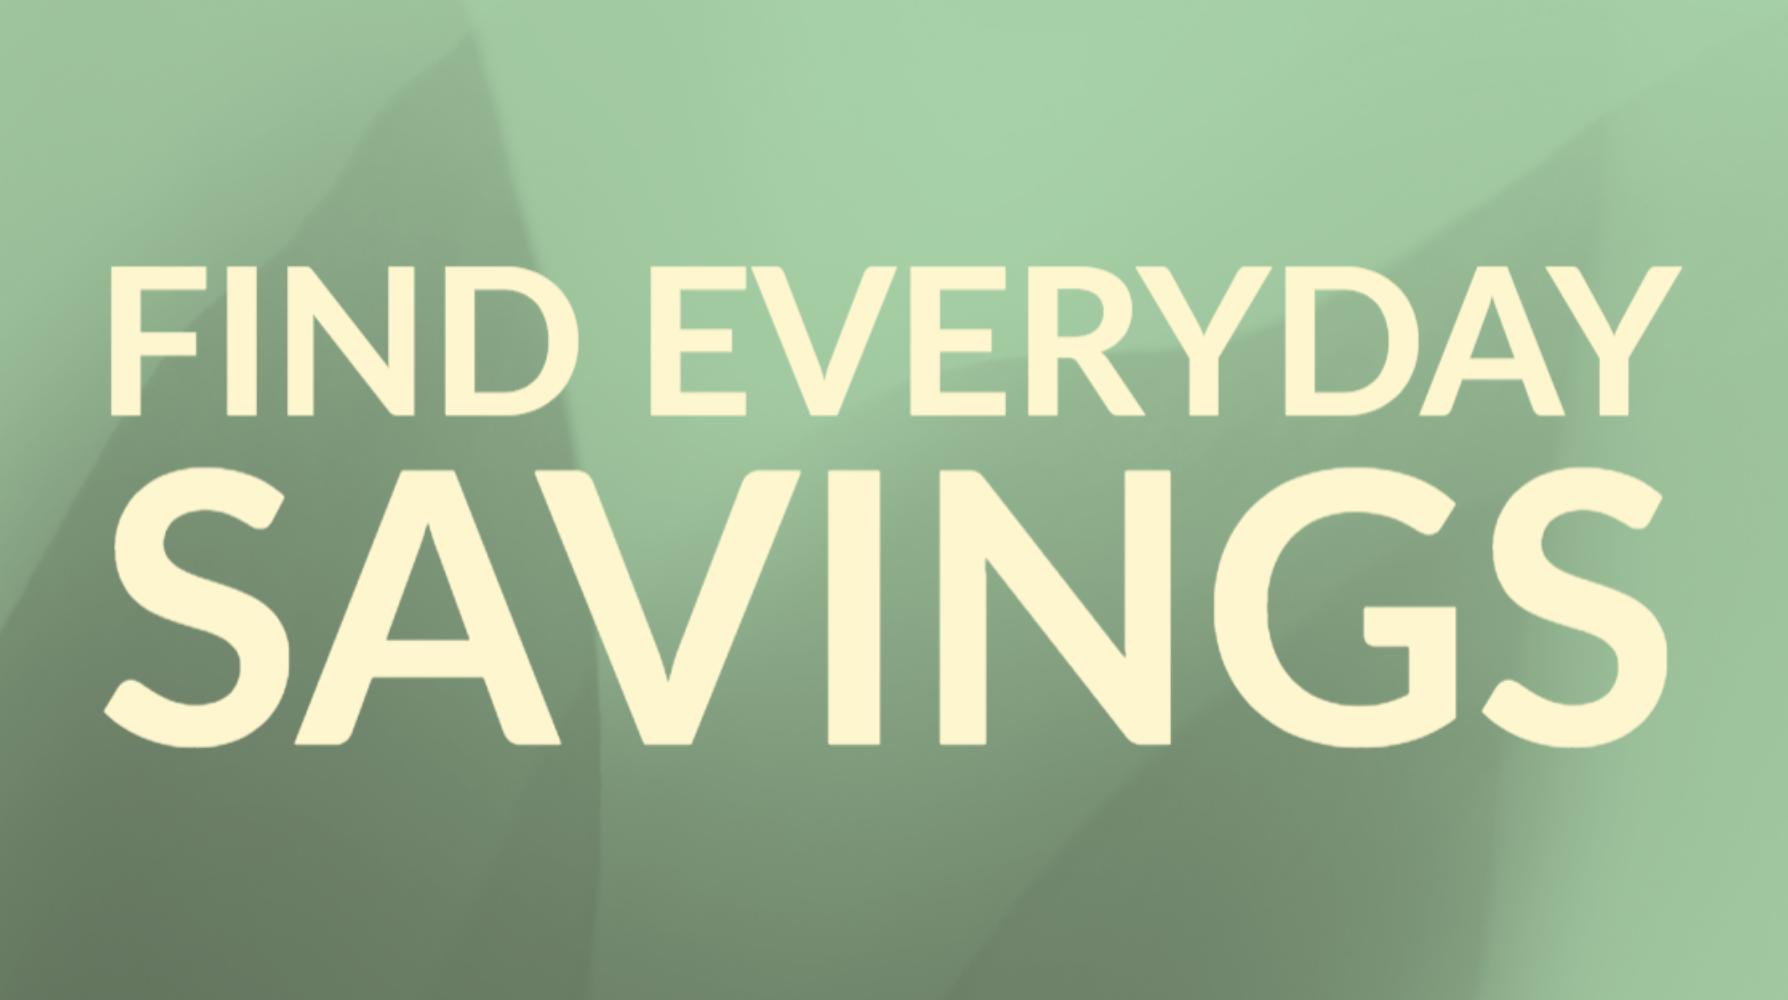 Find everyday savings